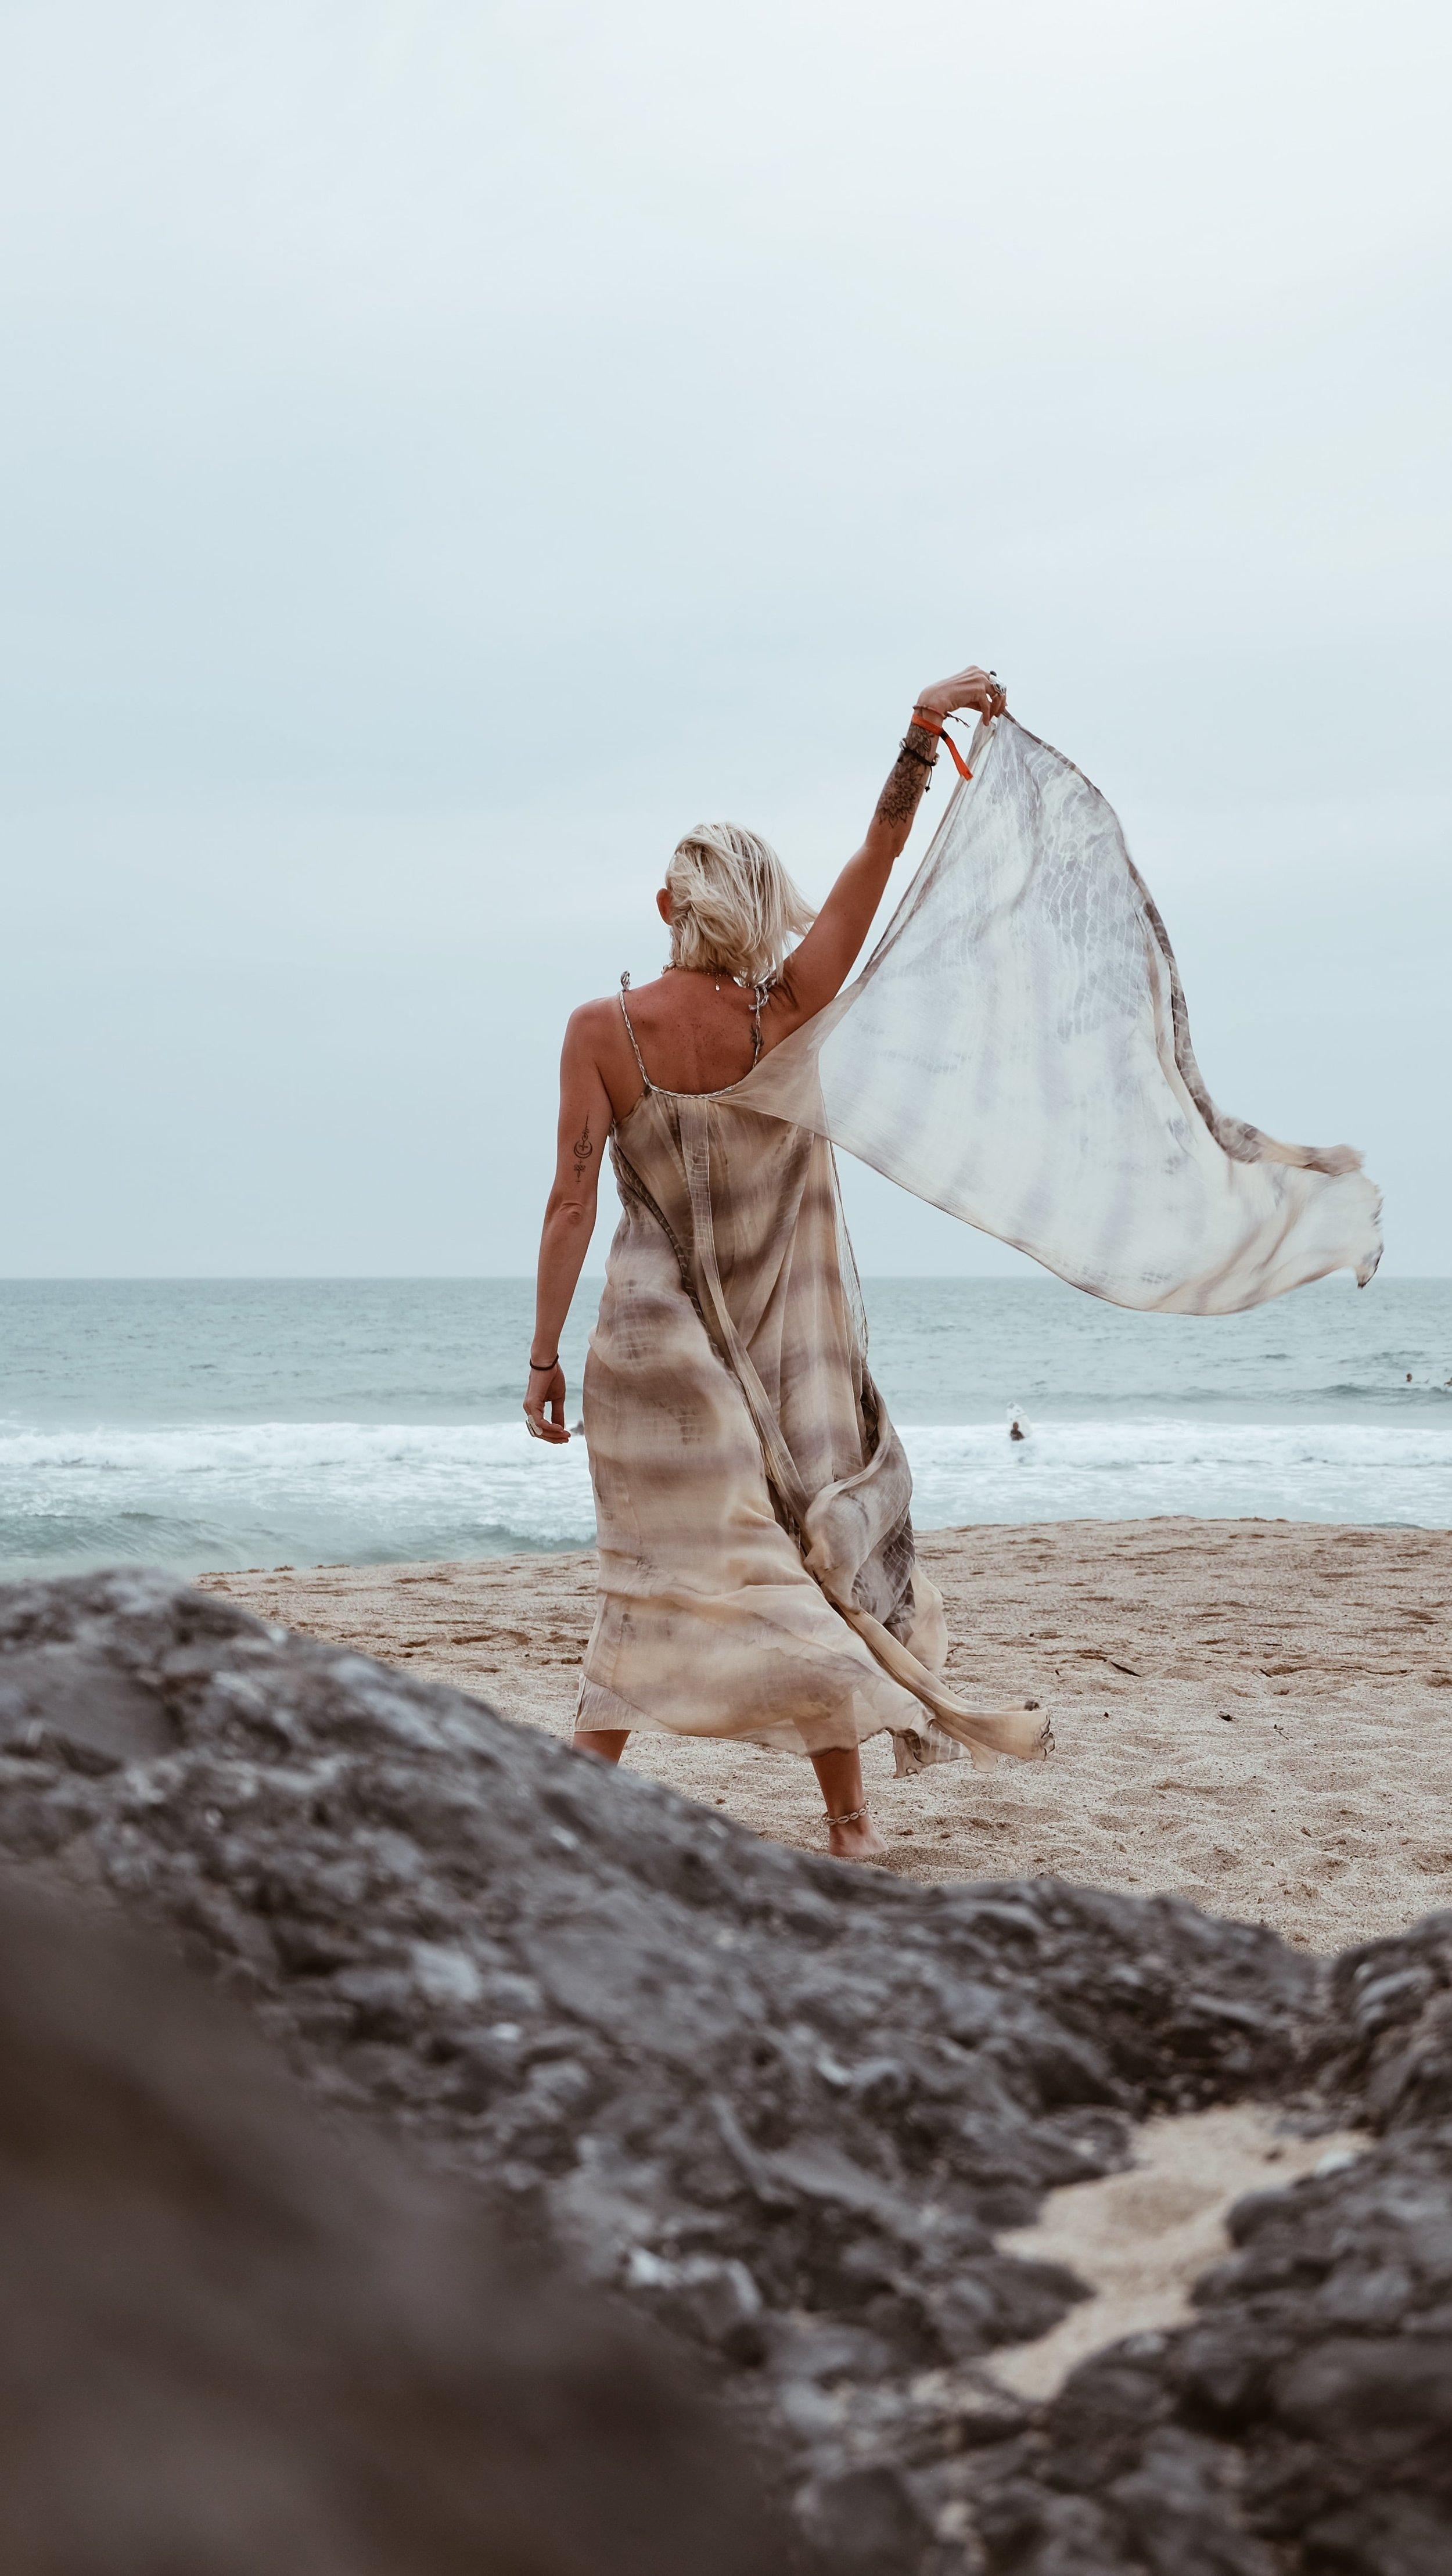 Carnet sauvage- blog mode - robe mesdemoiselles paris26-min.JPG